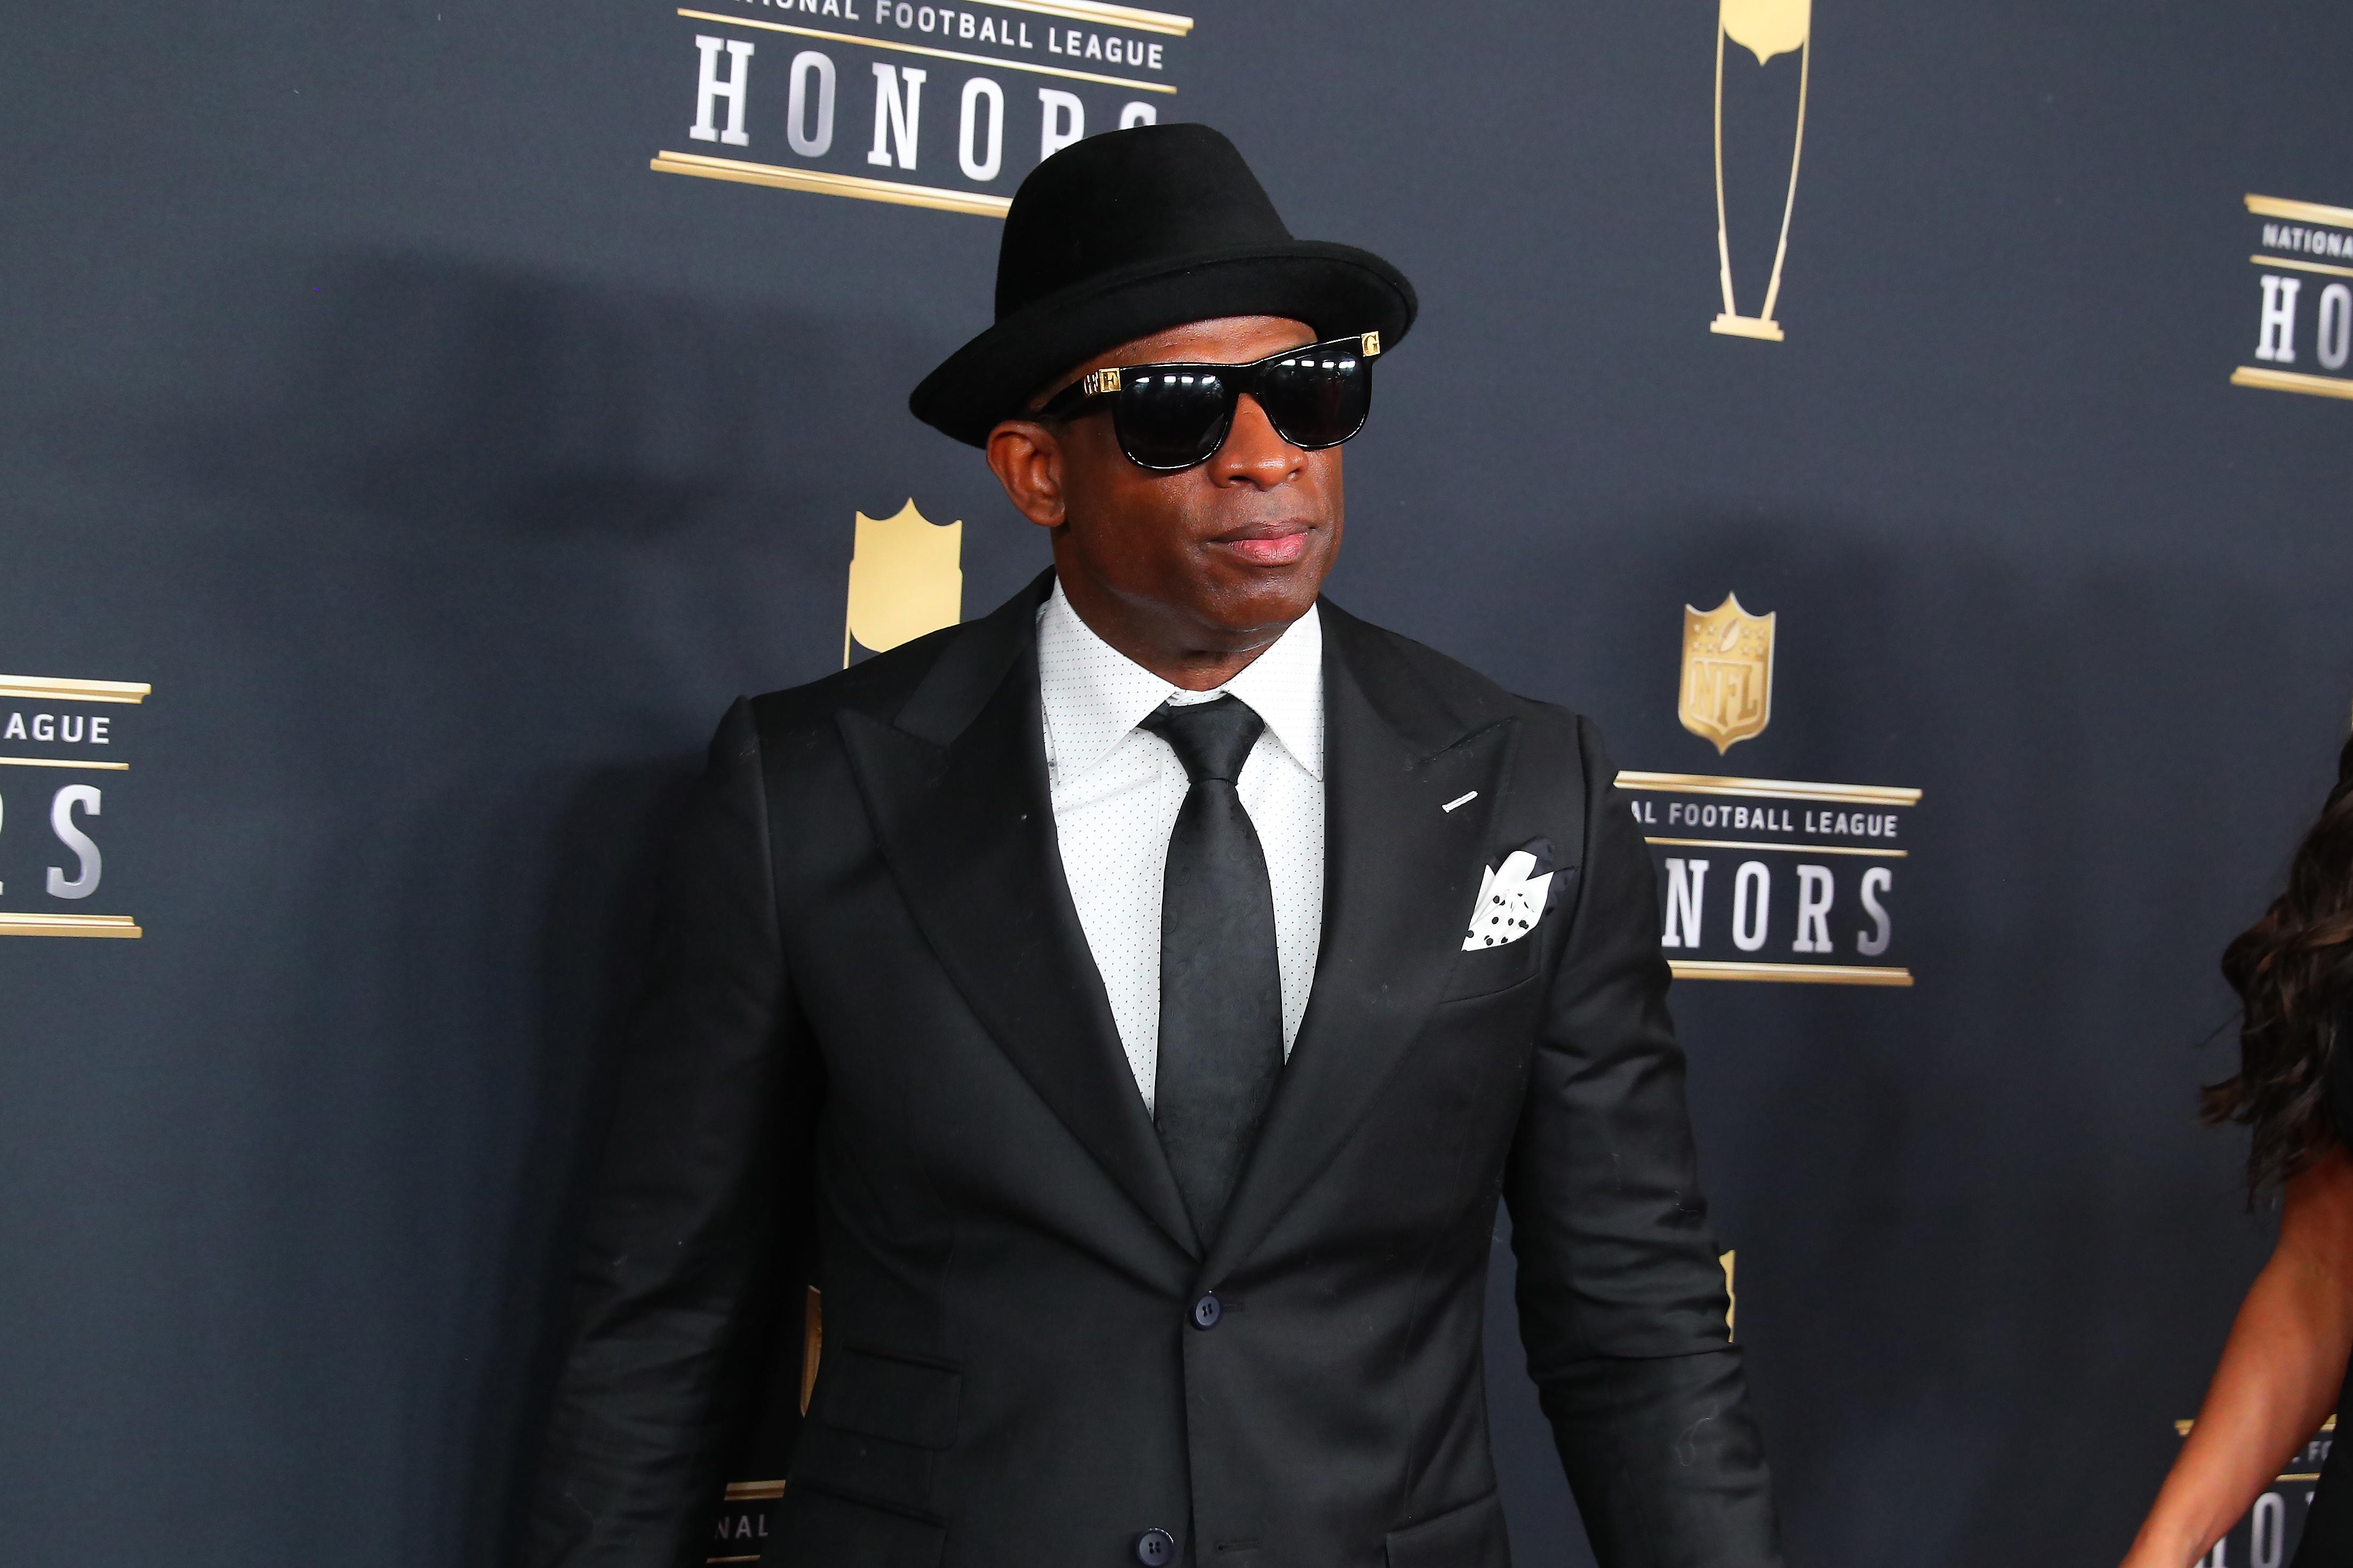 NFL: FEB 03 Super Bowl LII - NFL Honors